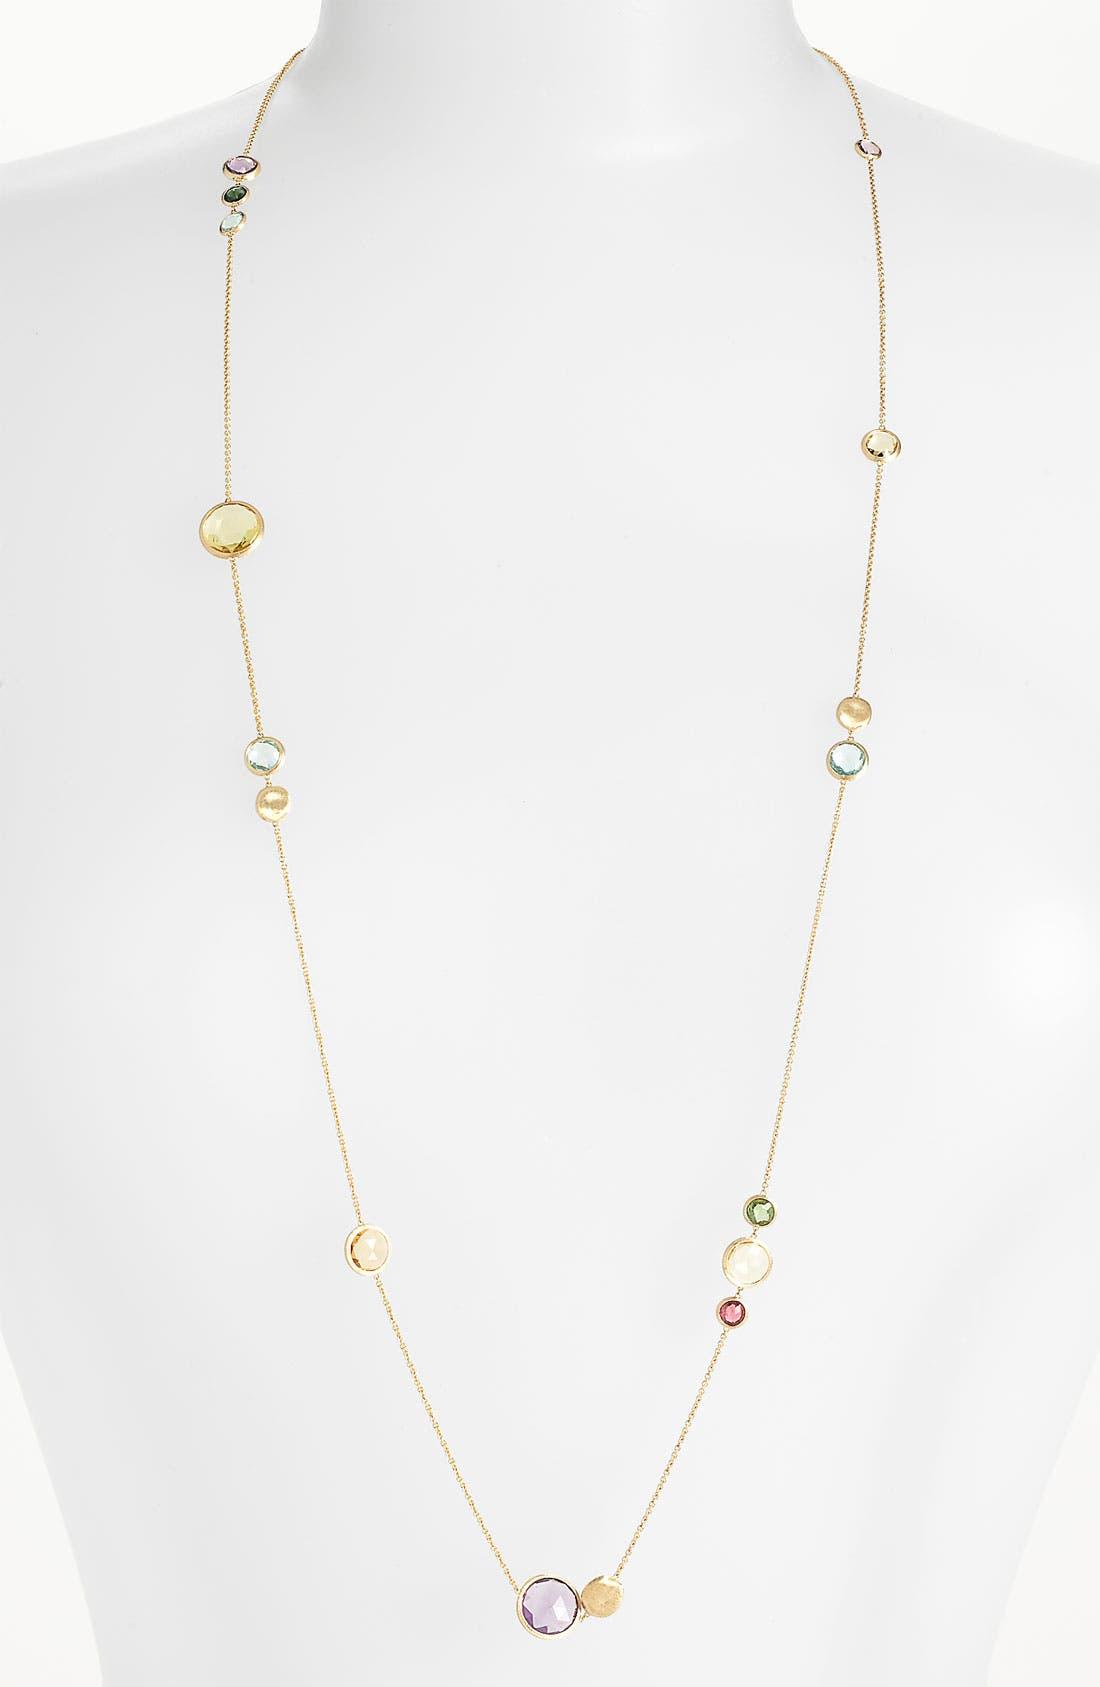 Main Image - Marco Bicego 'Jaipur' Long Station Necklace